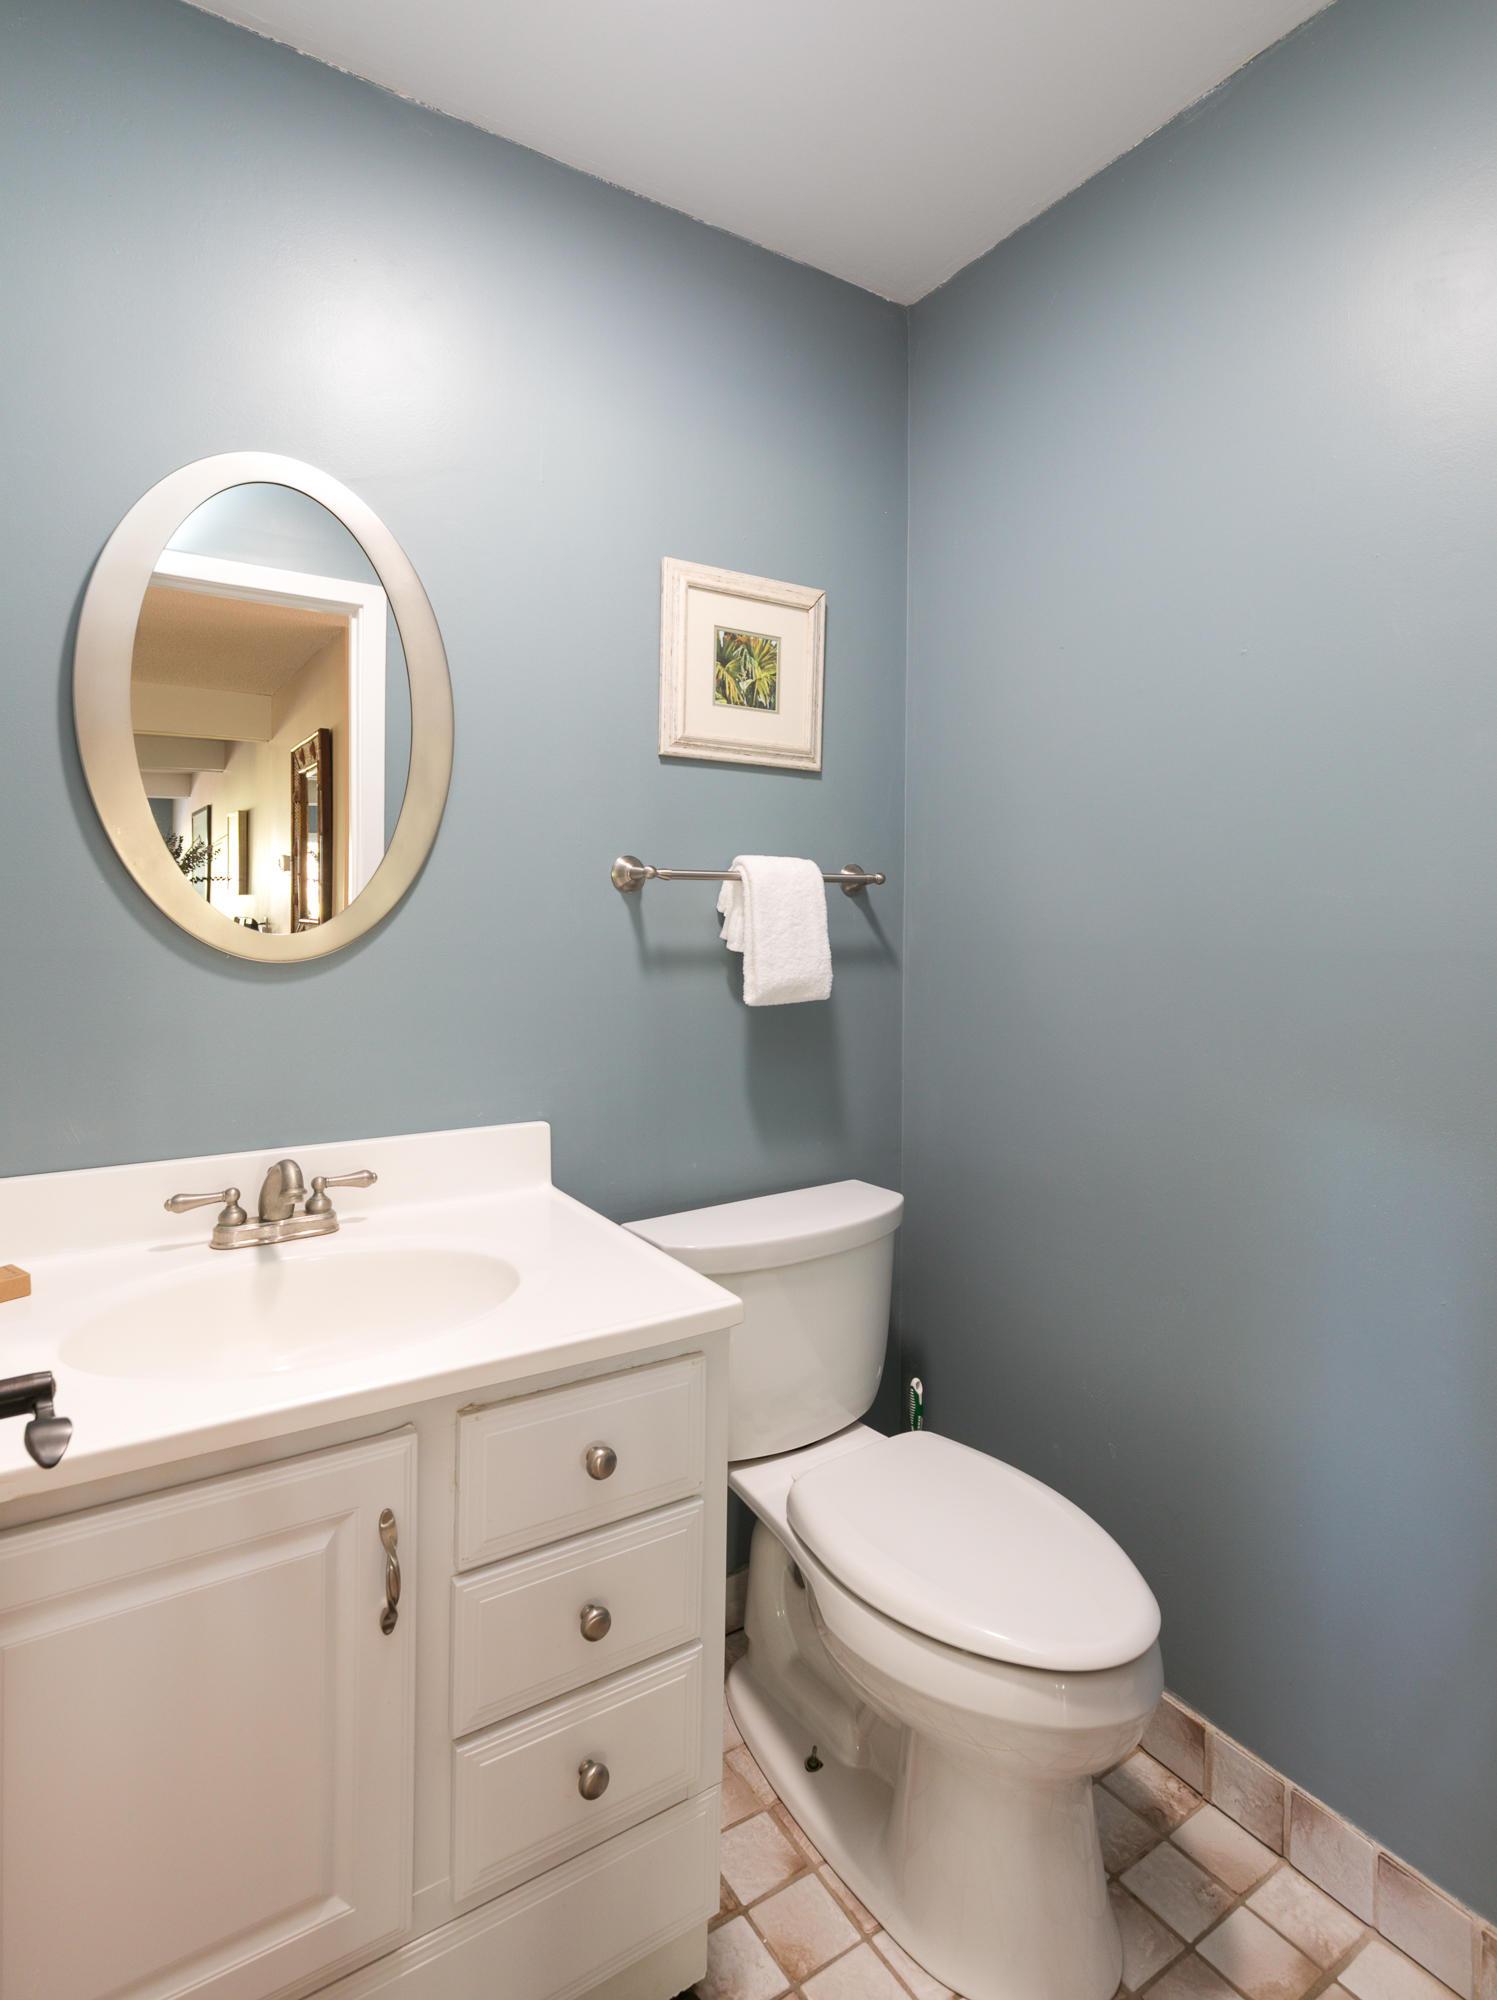 Seabrook Island Homes For Sale - 3080 Marshgate, Seabrook Island, SC - 25